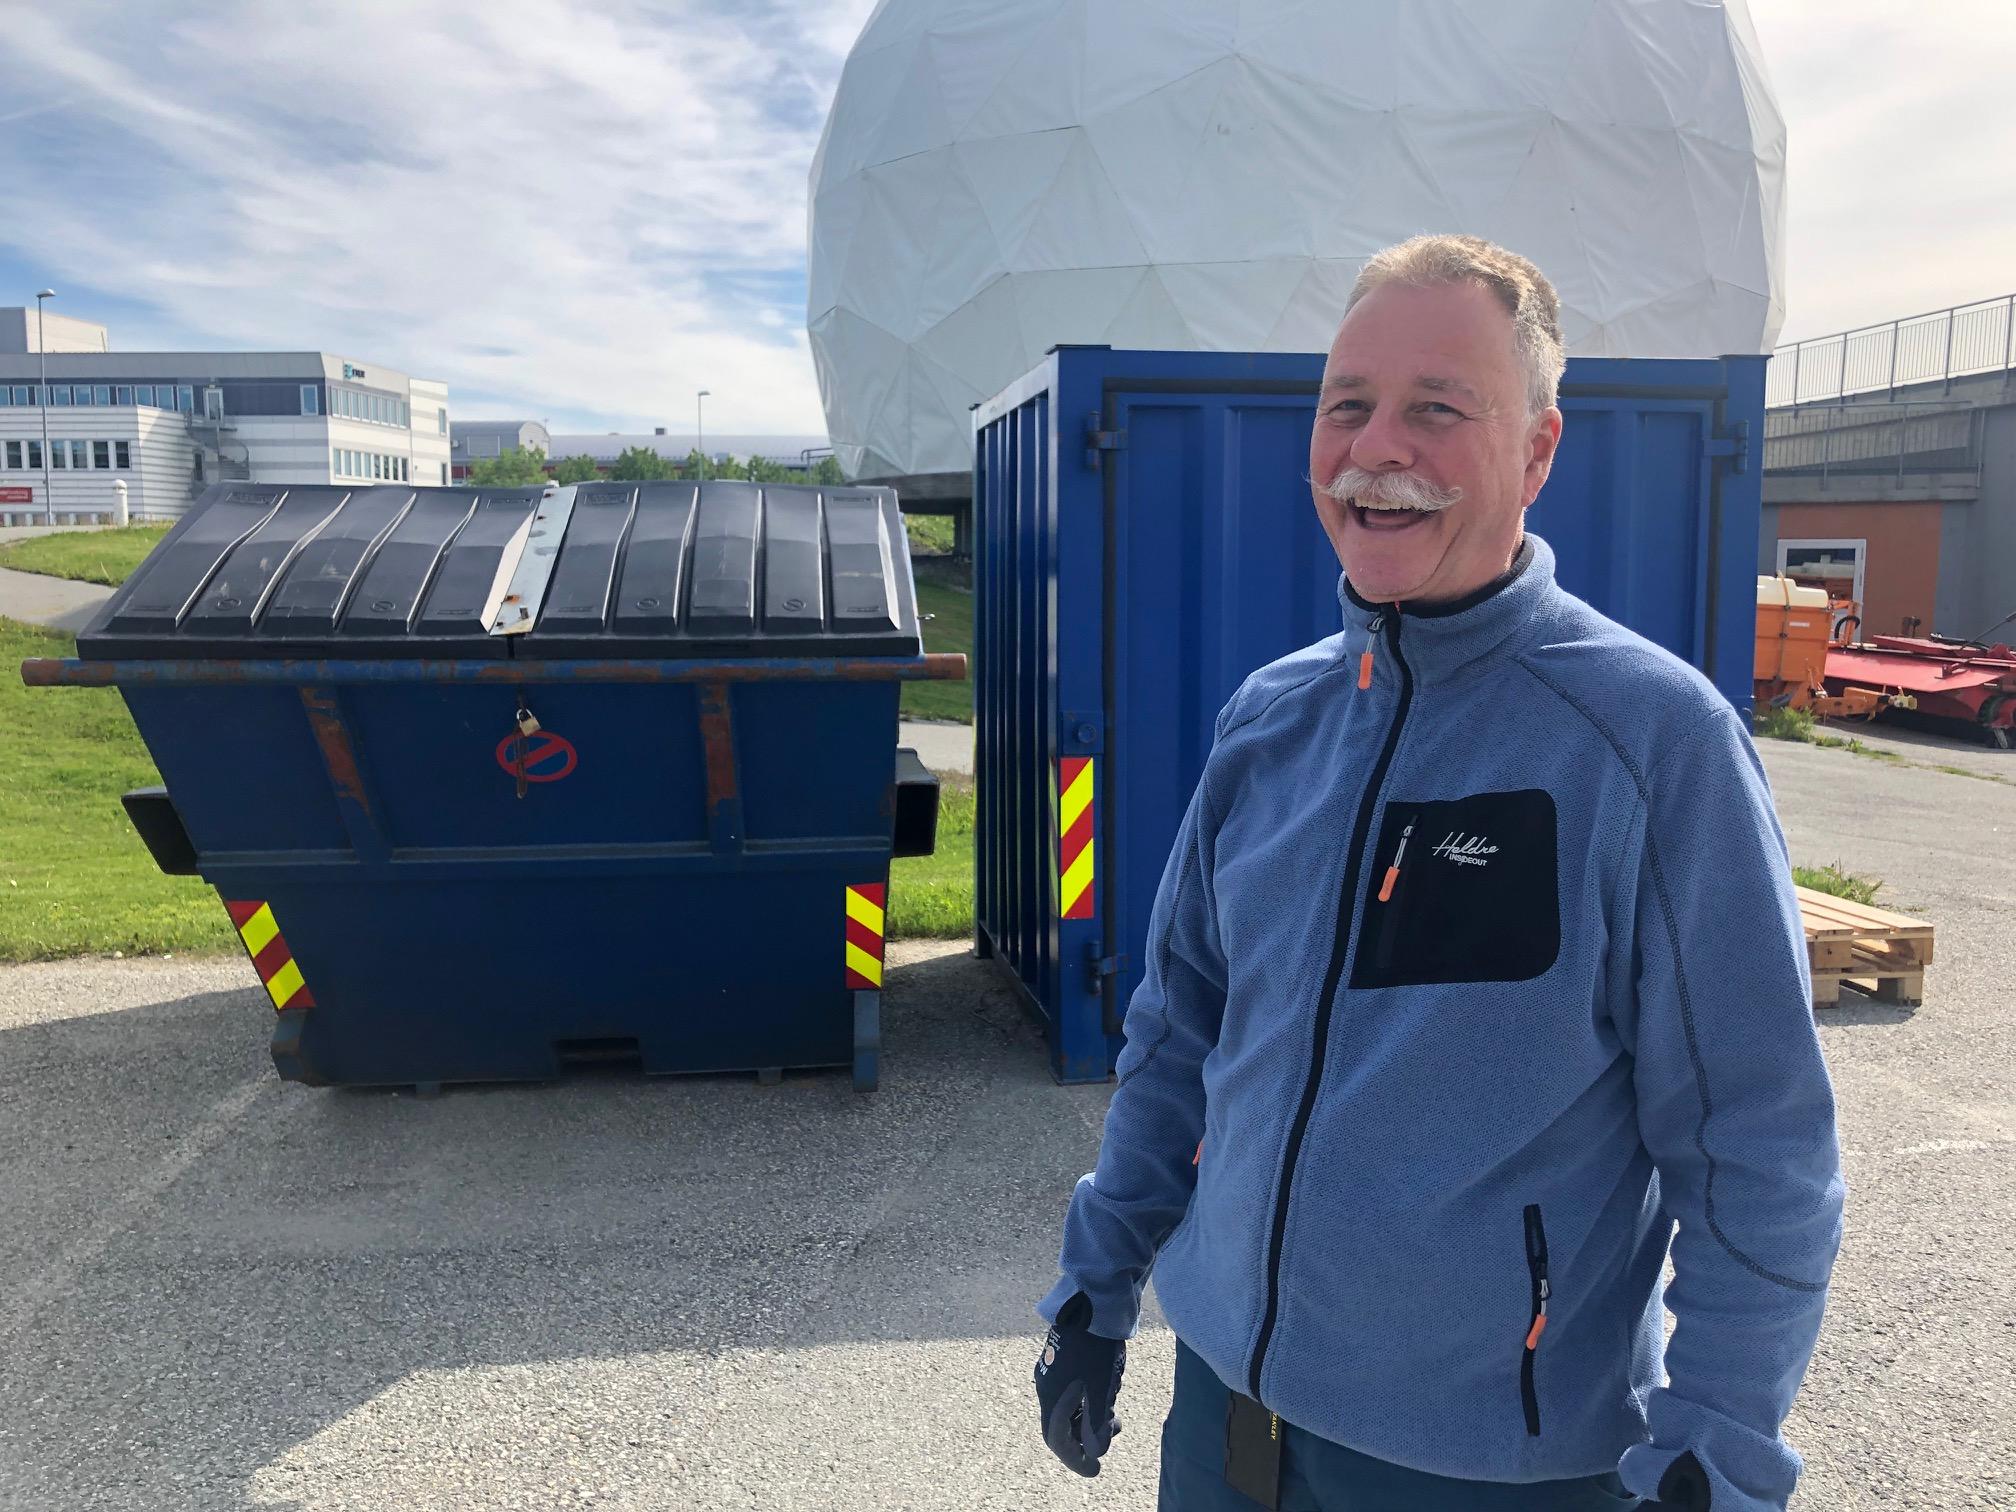 Harald Rubach er en av de ansatte på museet som har fokus på miljø i jobben sin.